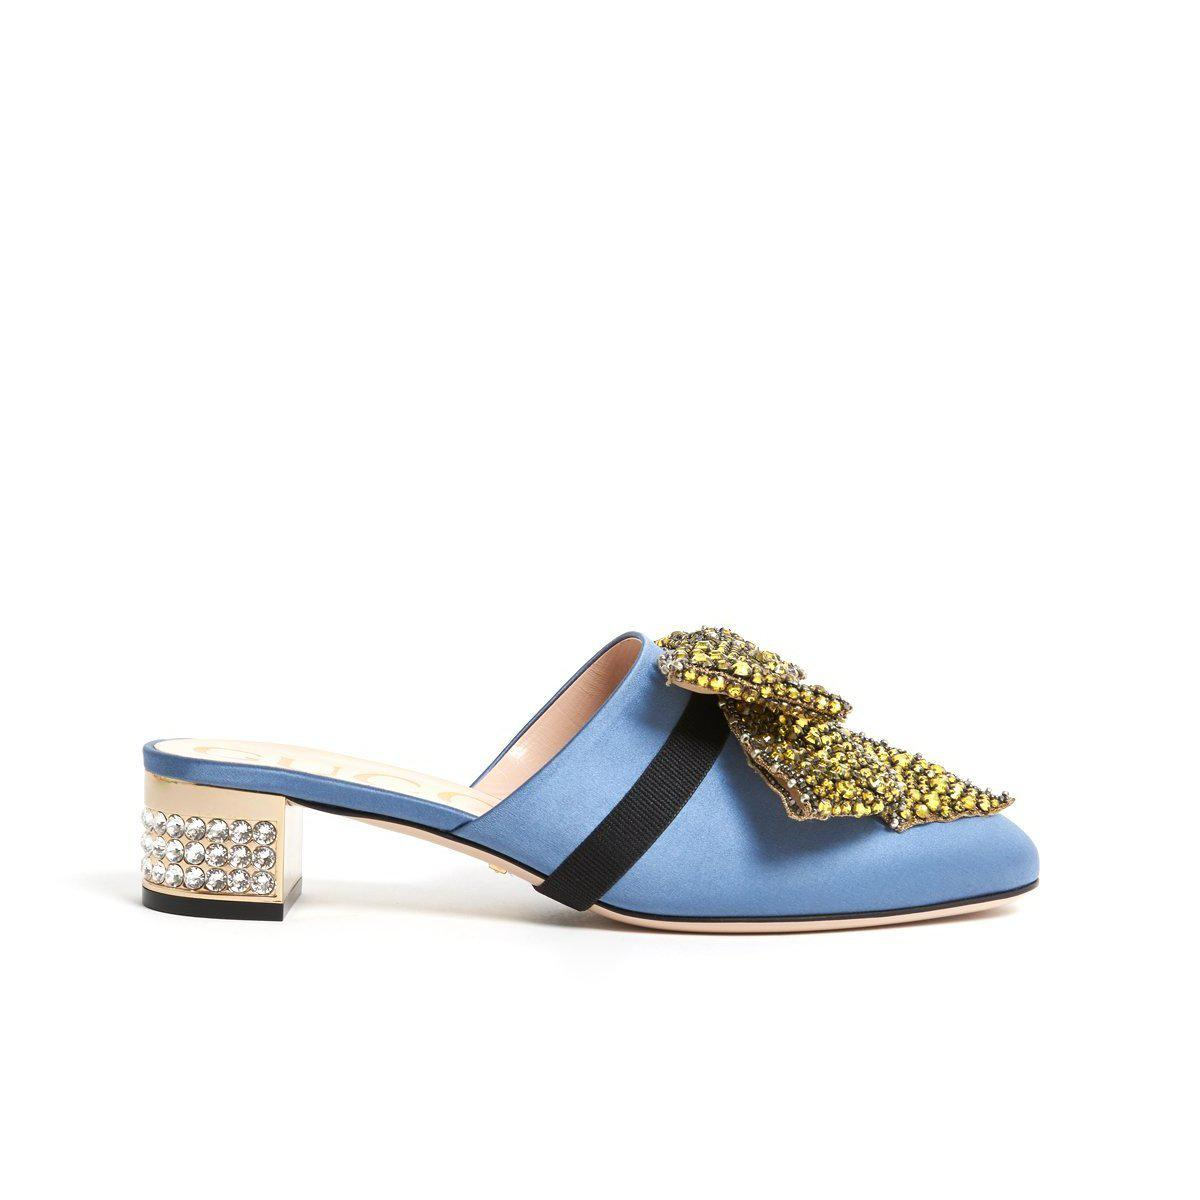 ea6053e3cf3 Lyst - Gucci Embellished Heel Mules in Blue